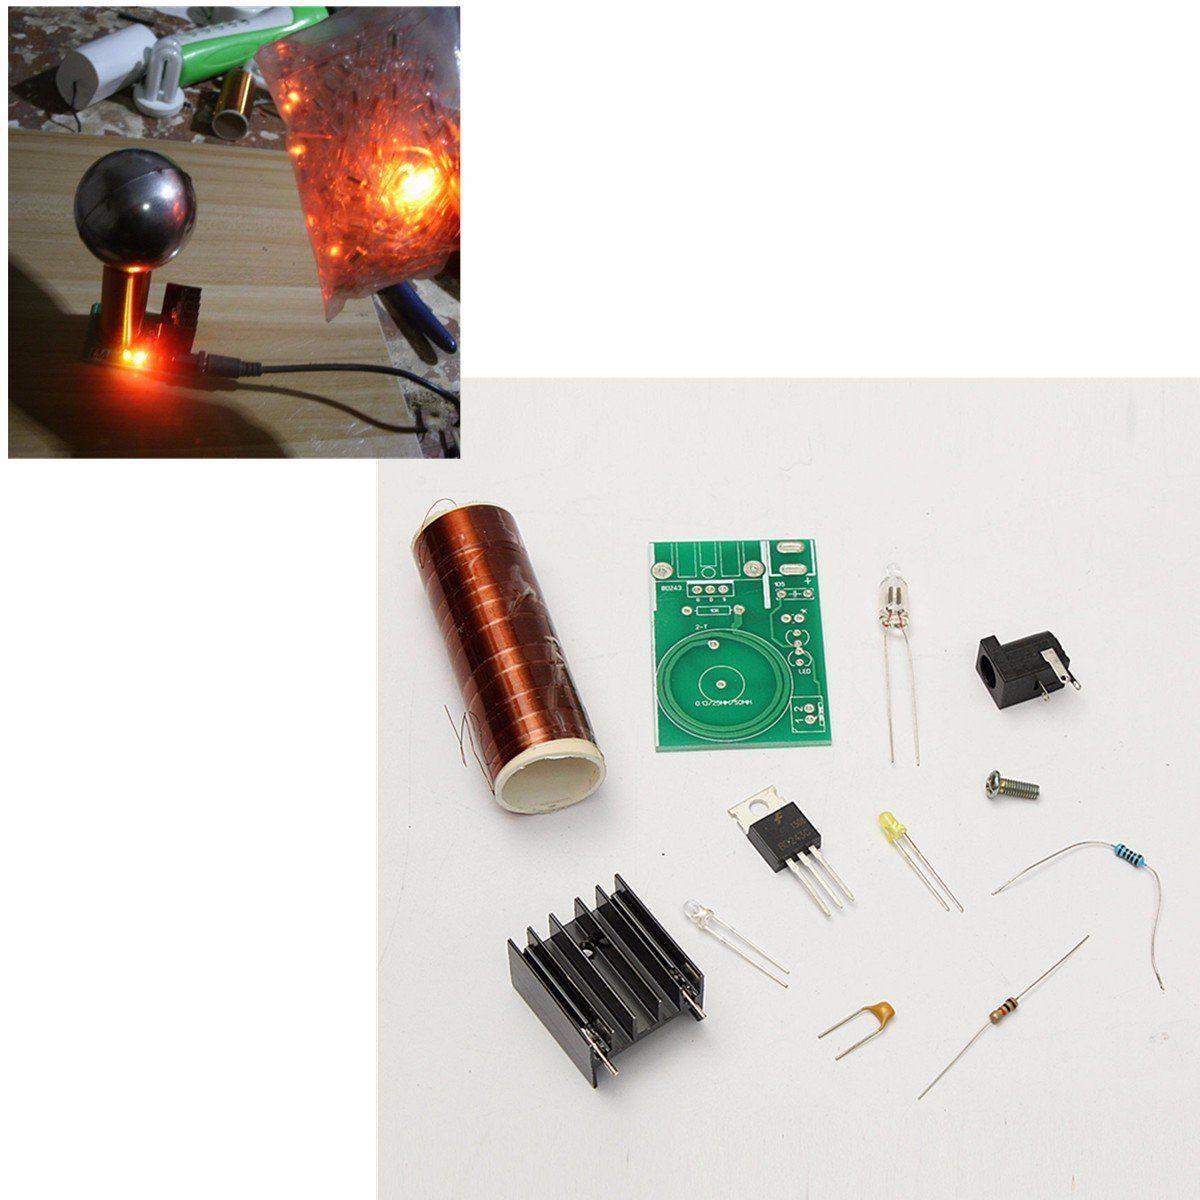 Dc 12v Mini Diy Tesla Coil Kit Arc Wireless Electric Power Transmission Circuit Lighting